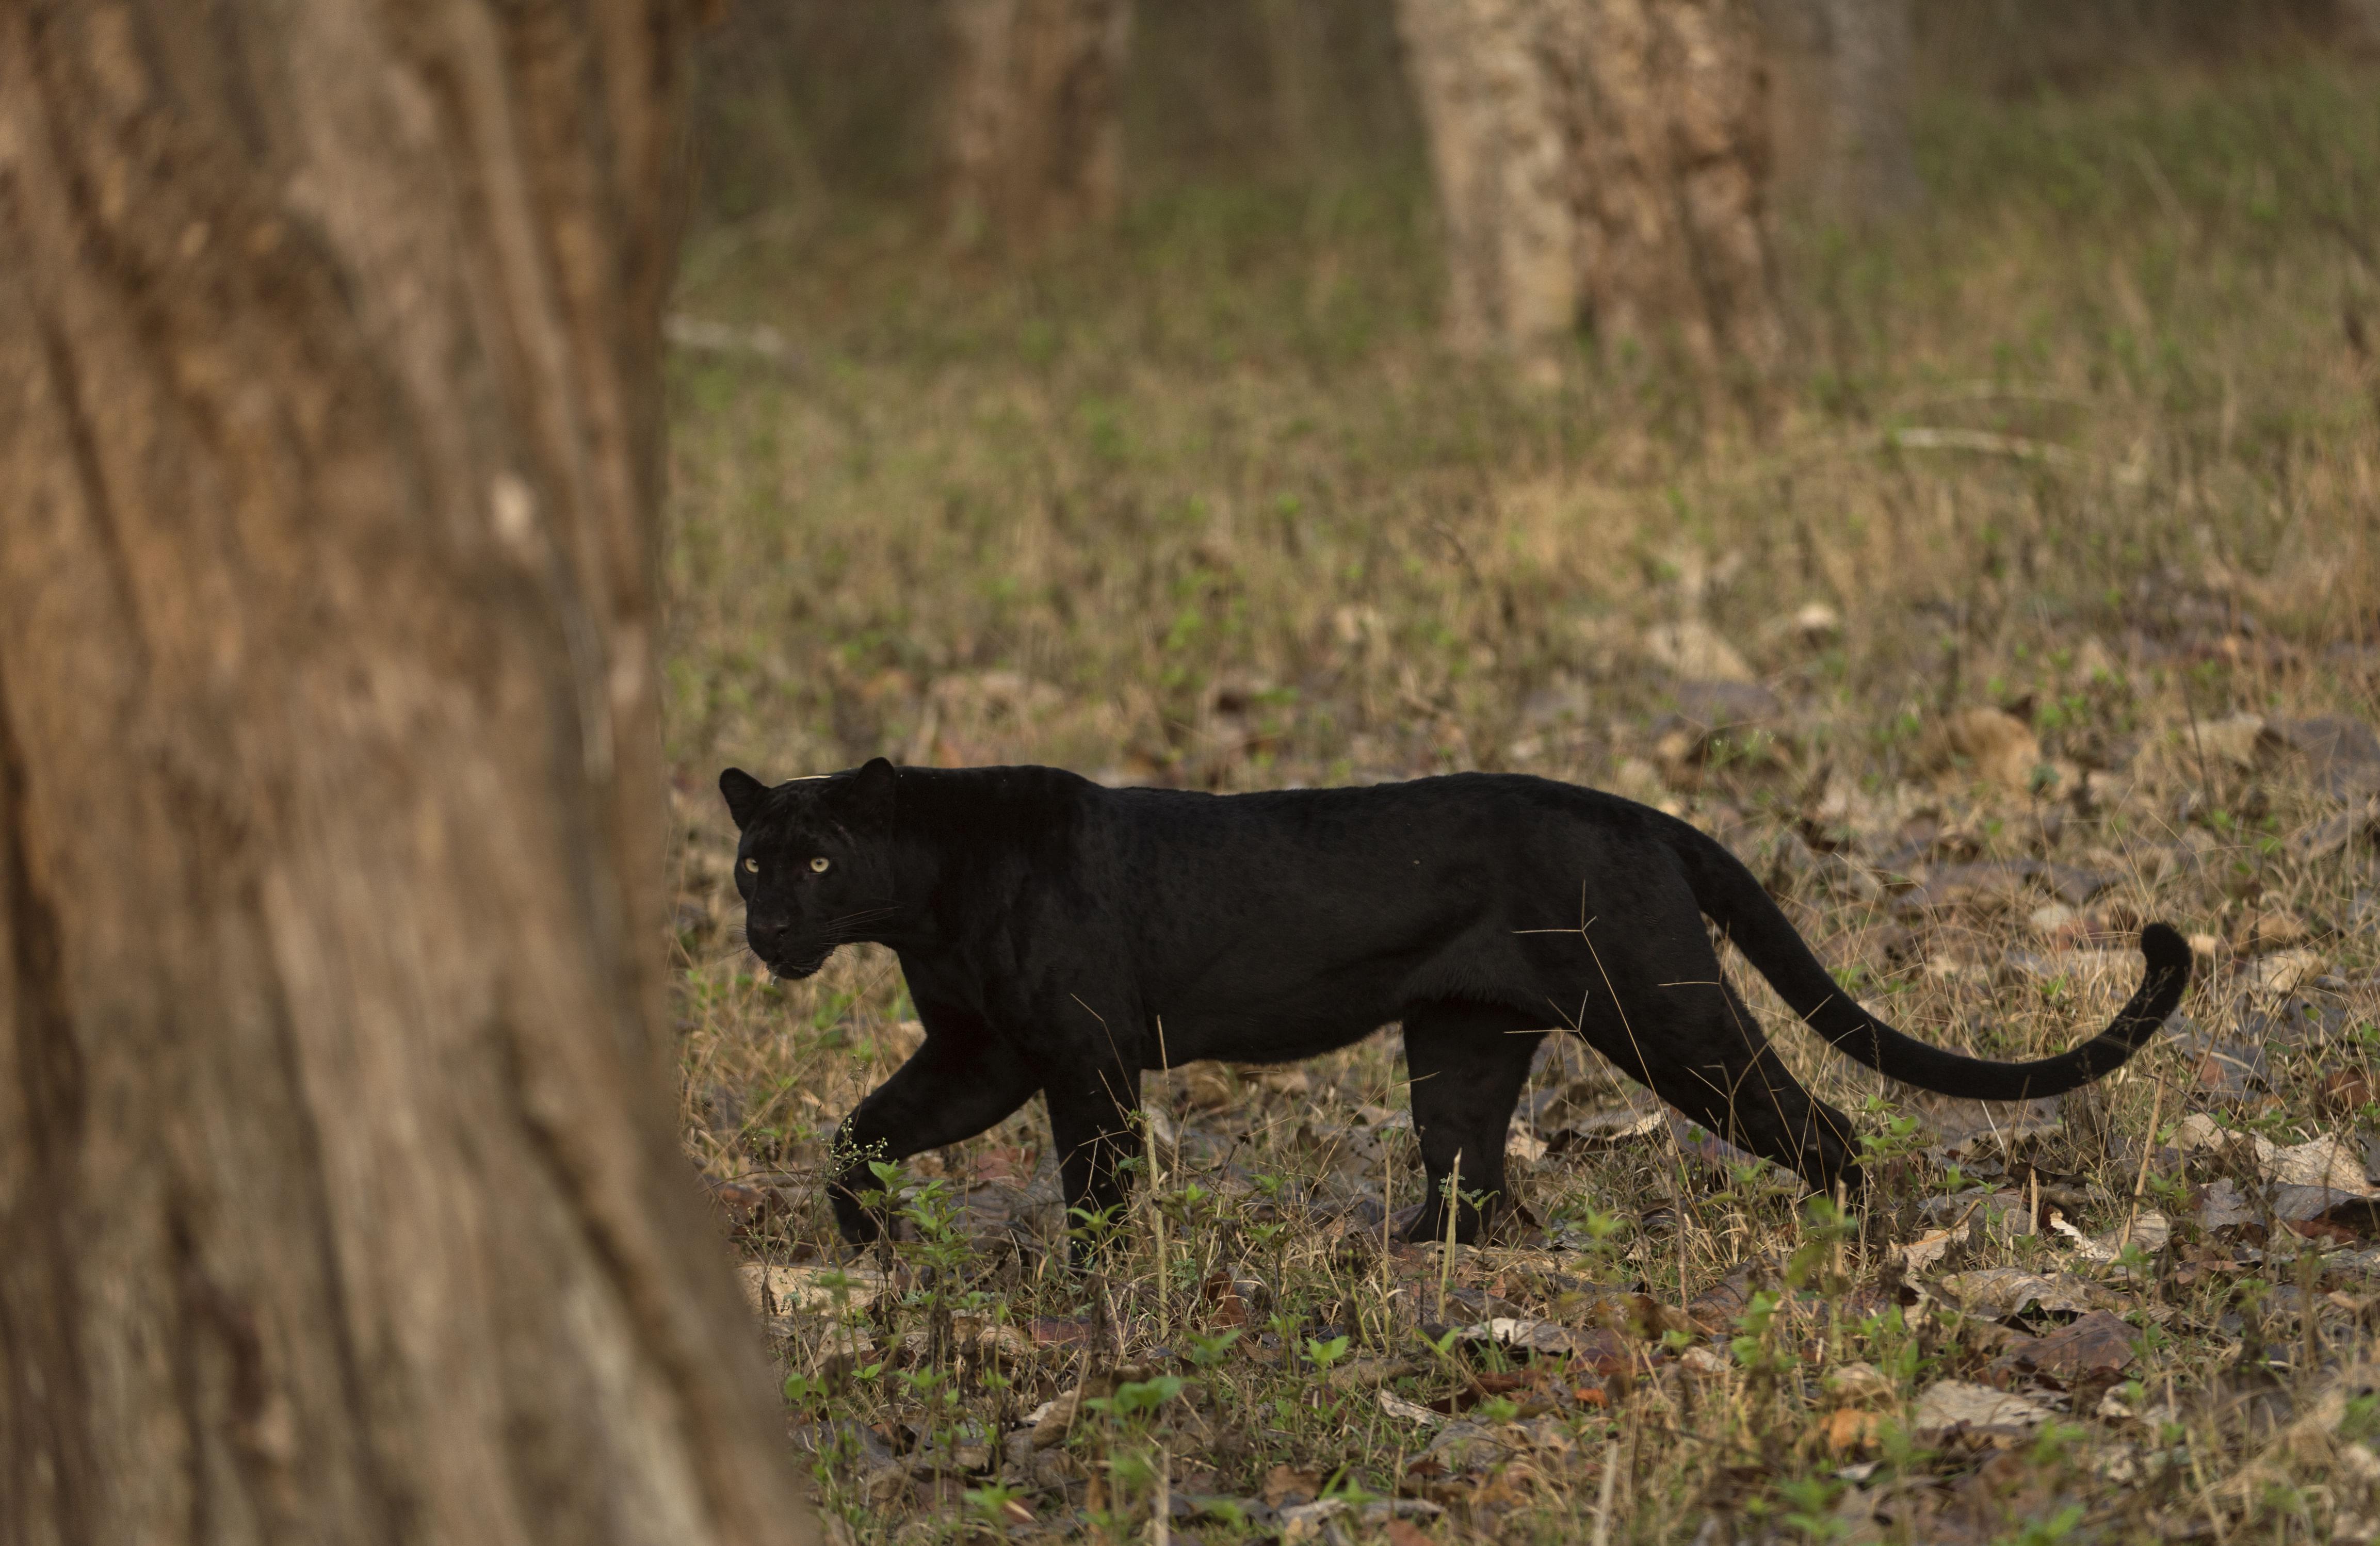 Still from the Wild Karnataka documentary. (Source: Kalyan Varma)